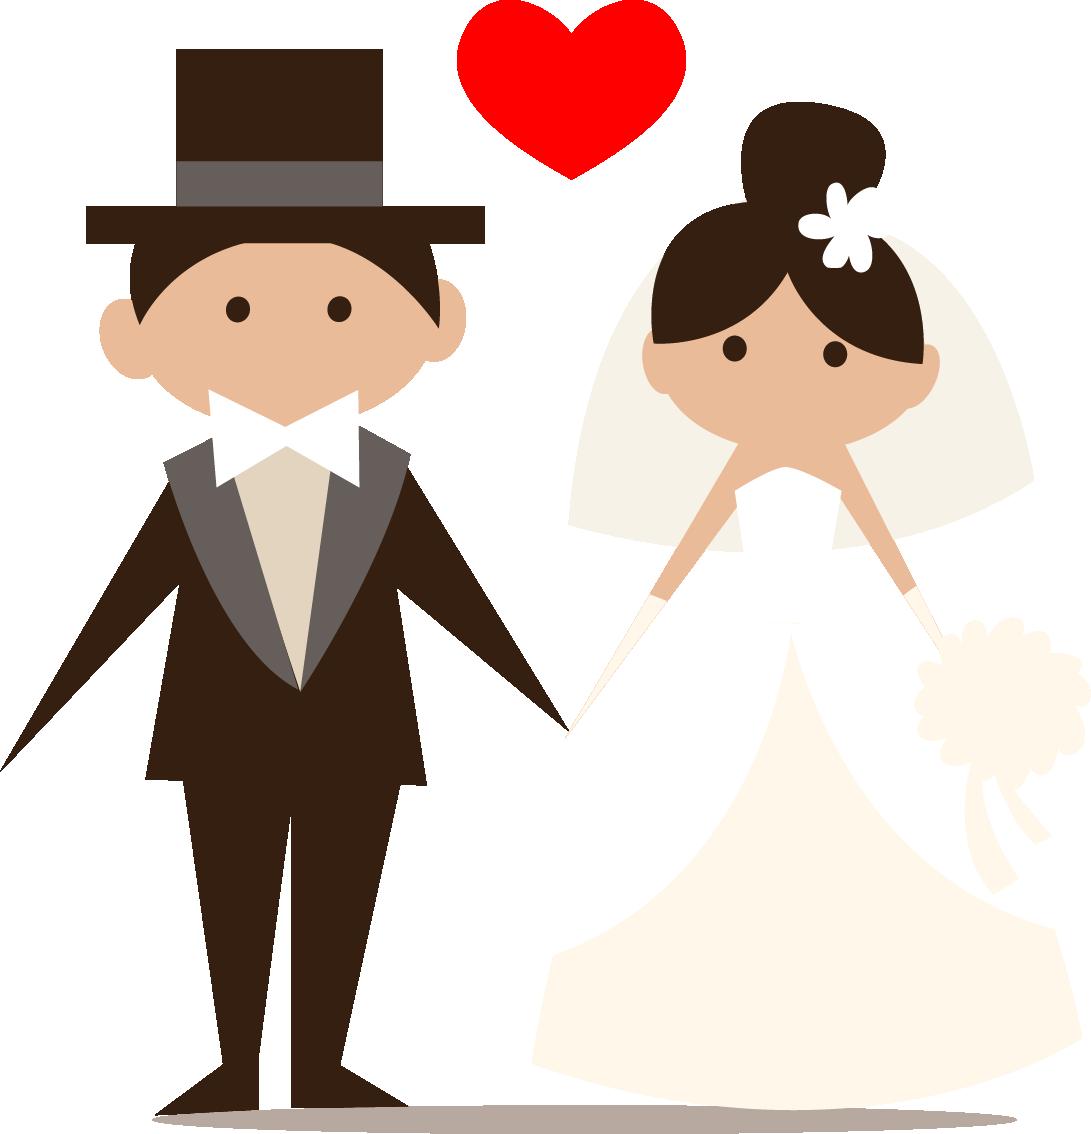 Wedding Clipart Free.Clipart Church Wedding Clipart Church Wedding Transparent Free For